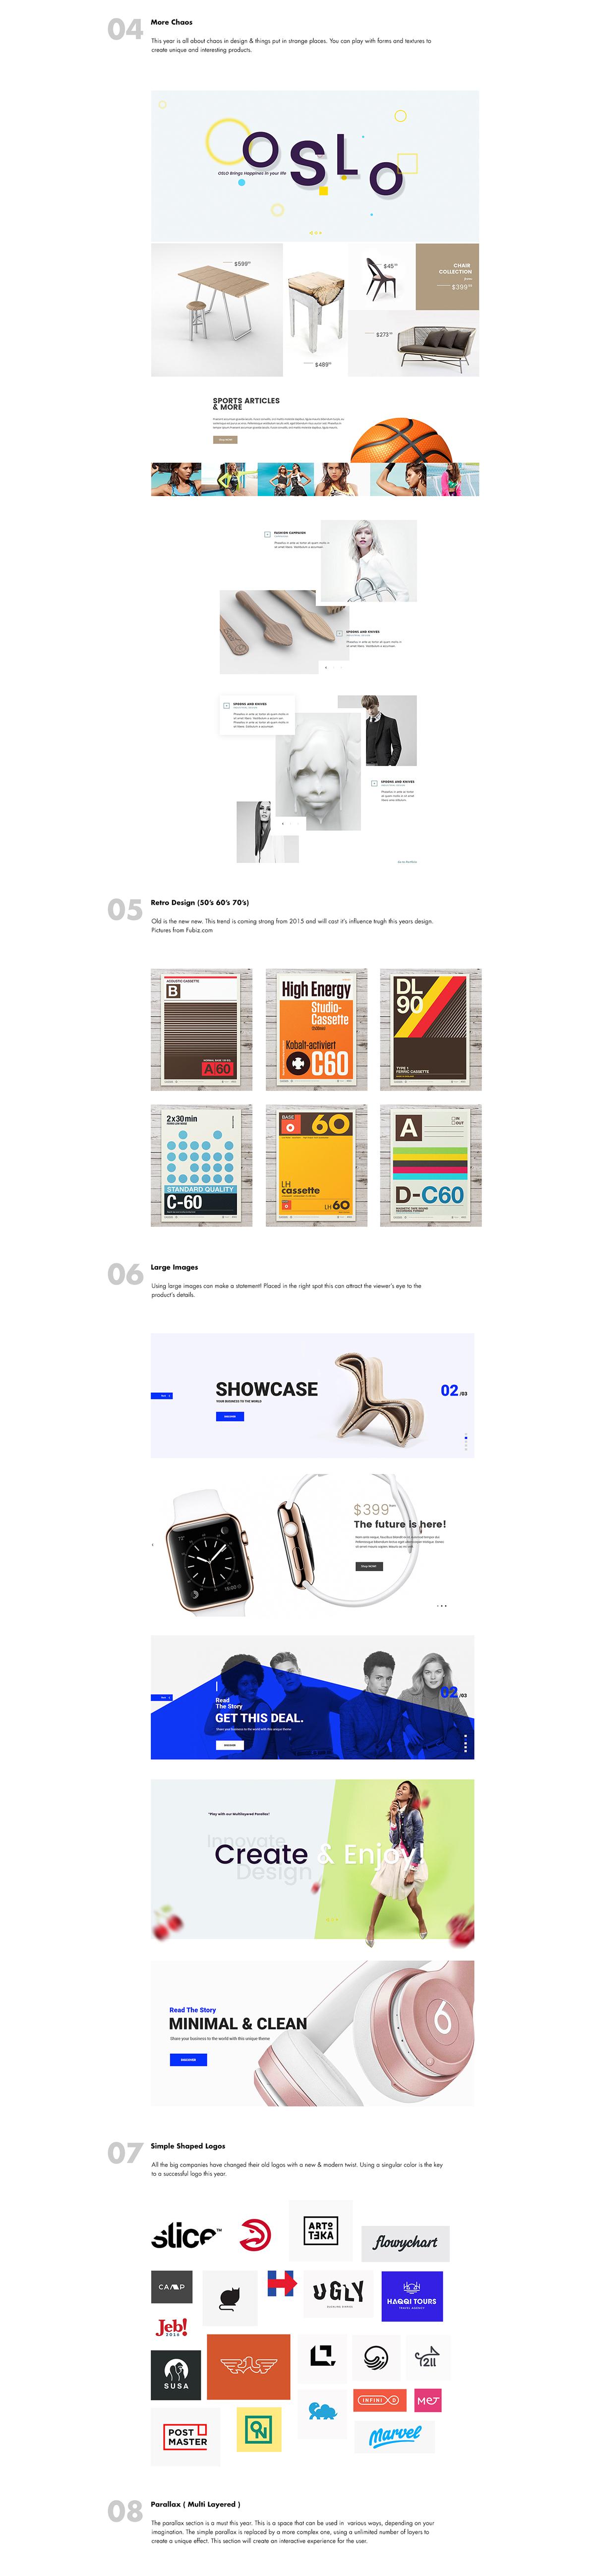 Web Design Trends Behance